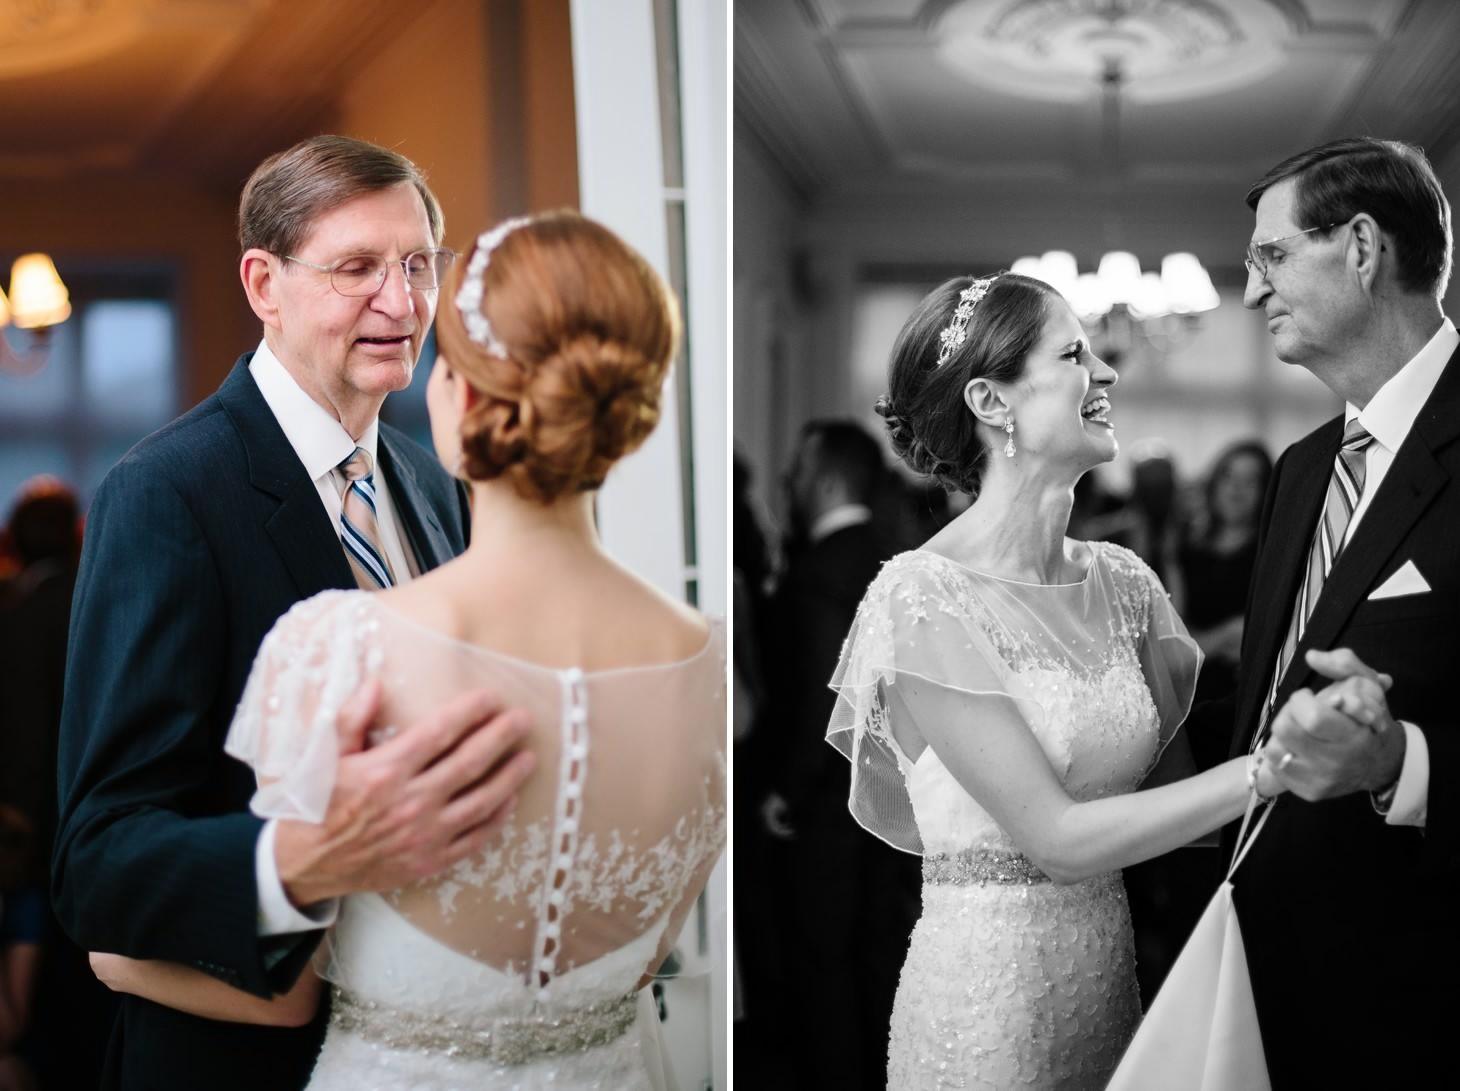 x-brooklyn-restaurant-wedding-nyc-weddingi-photographer-smitten-chickens170.jpg